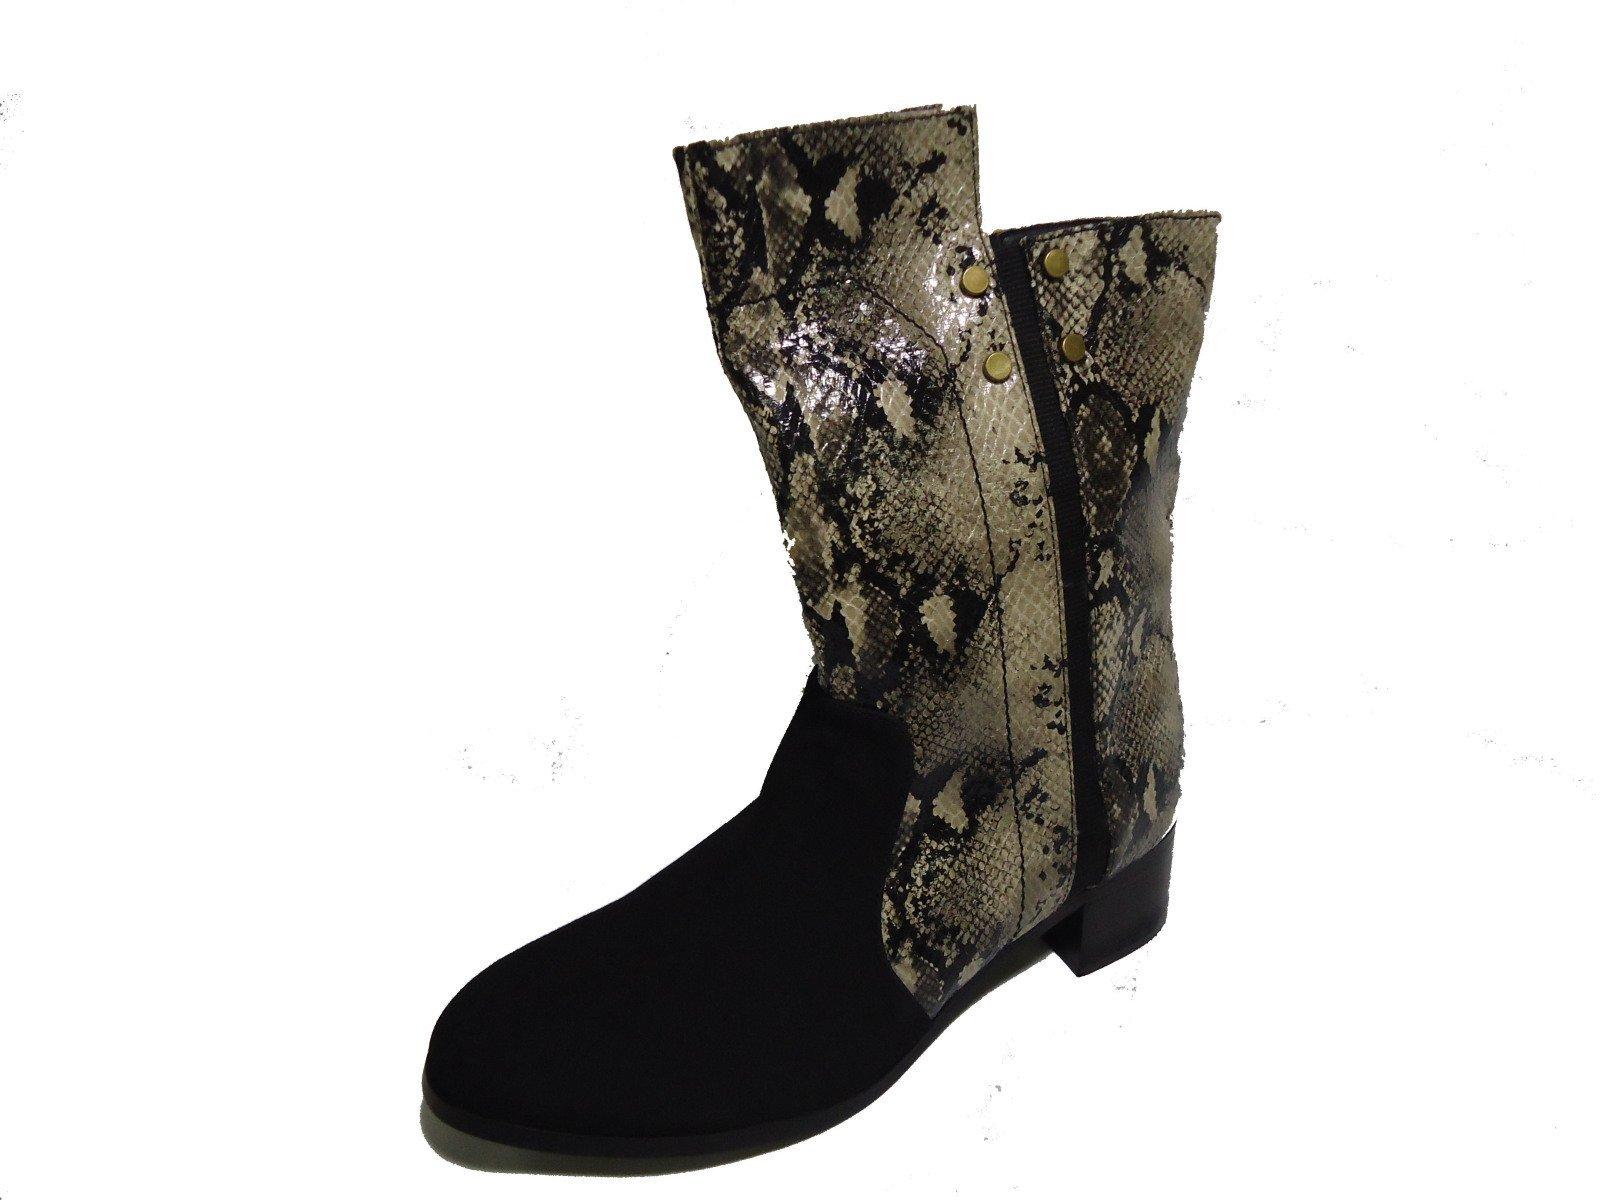 BE&D by Maison Dumain Maida Vale Roccia Thigh High Women Winter Shoe - $54.99